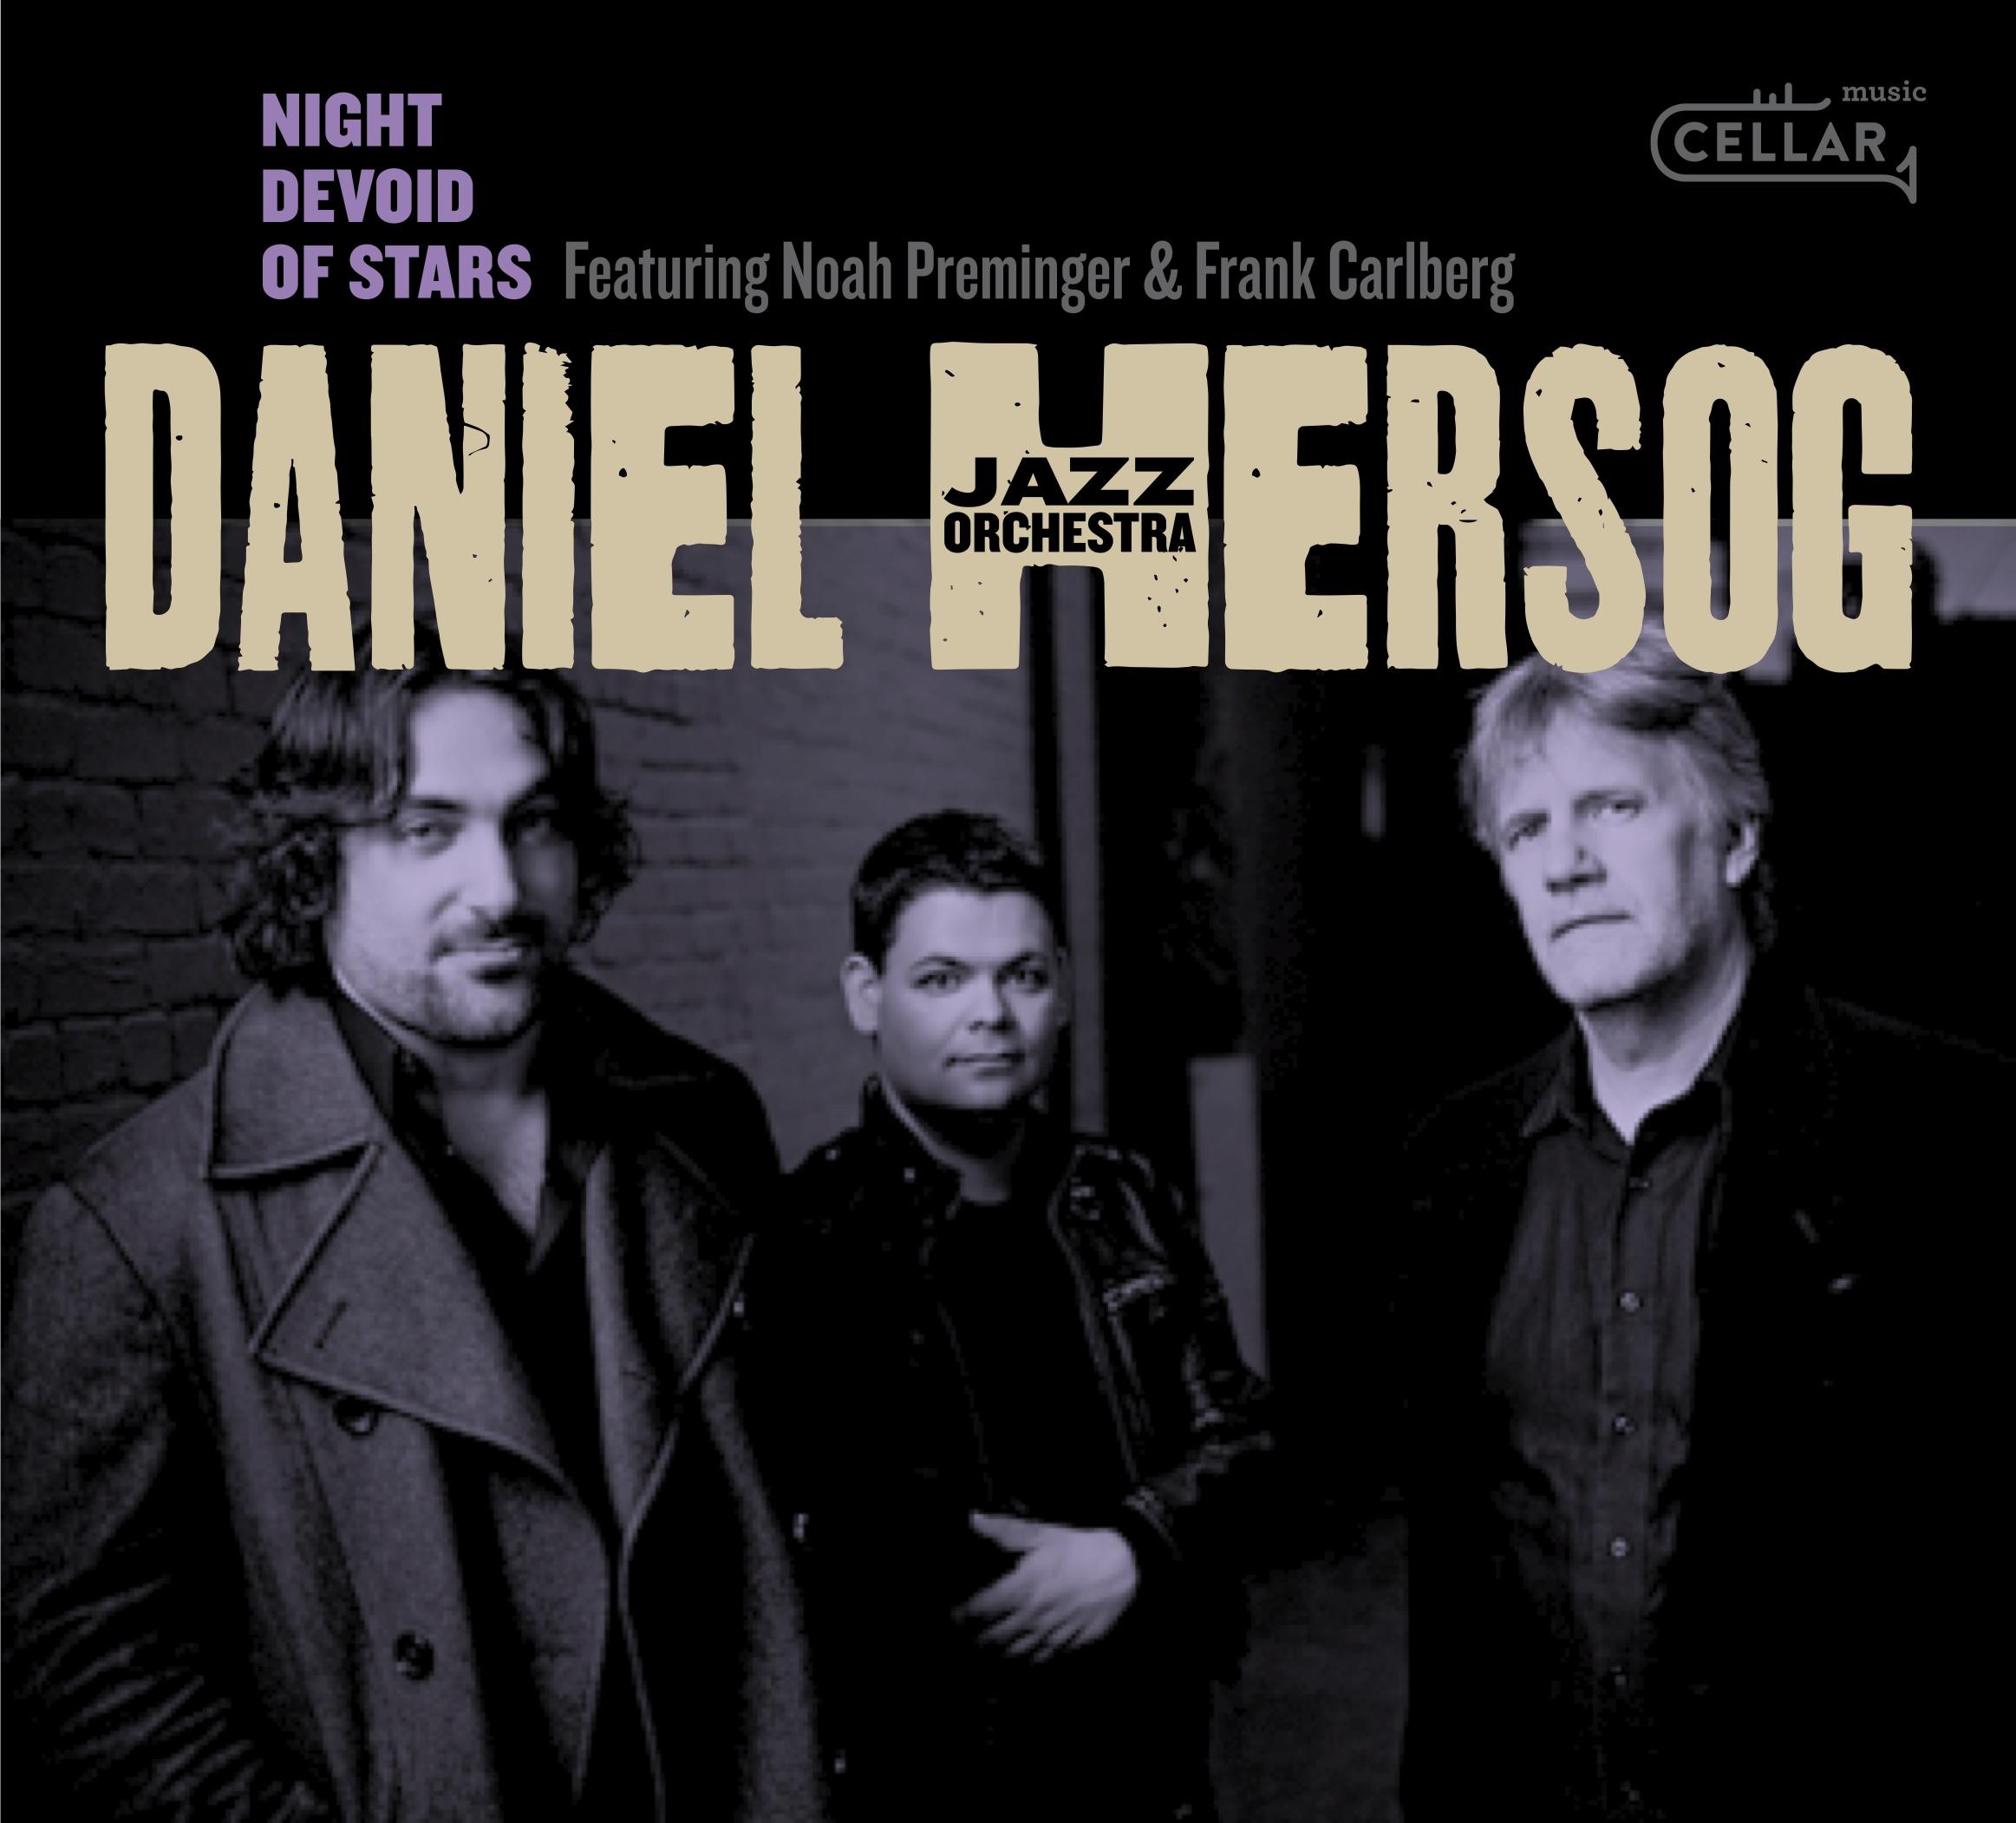 Hersog NIGHT DEVOID OF STARS Cover